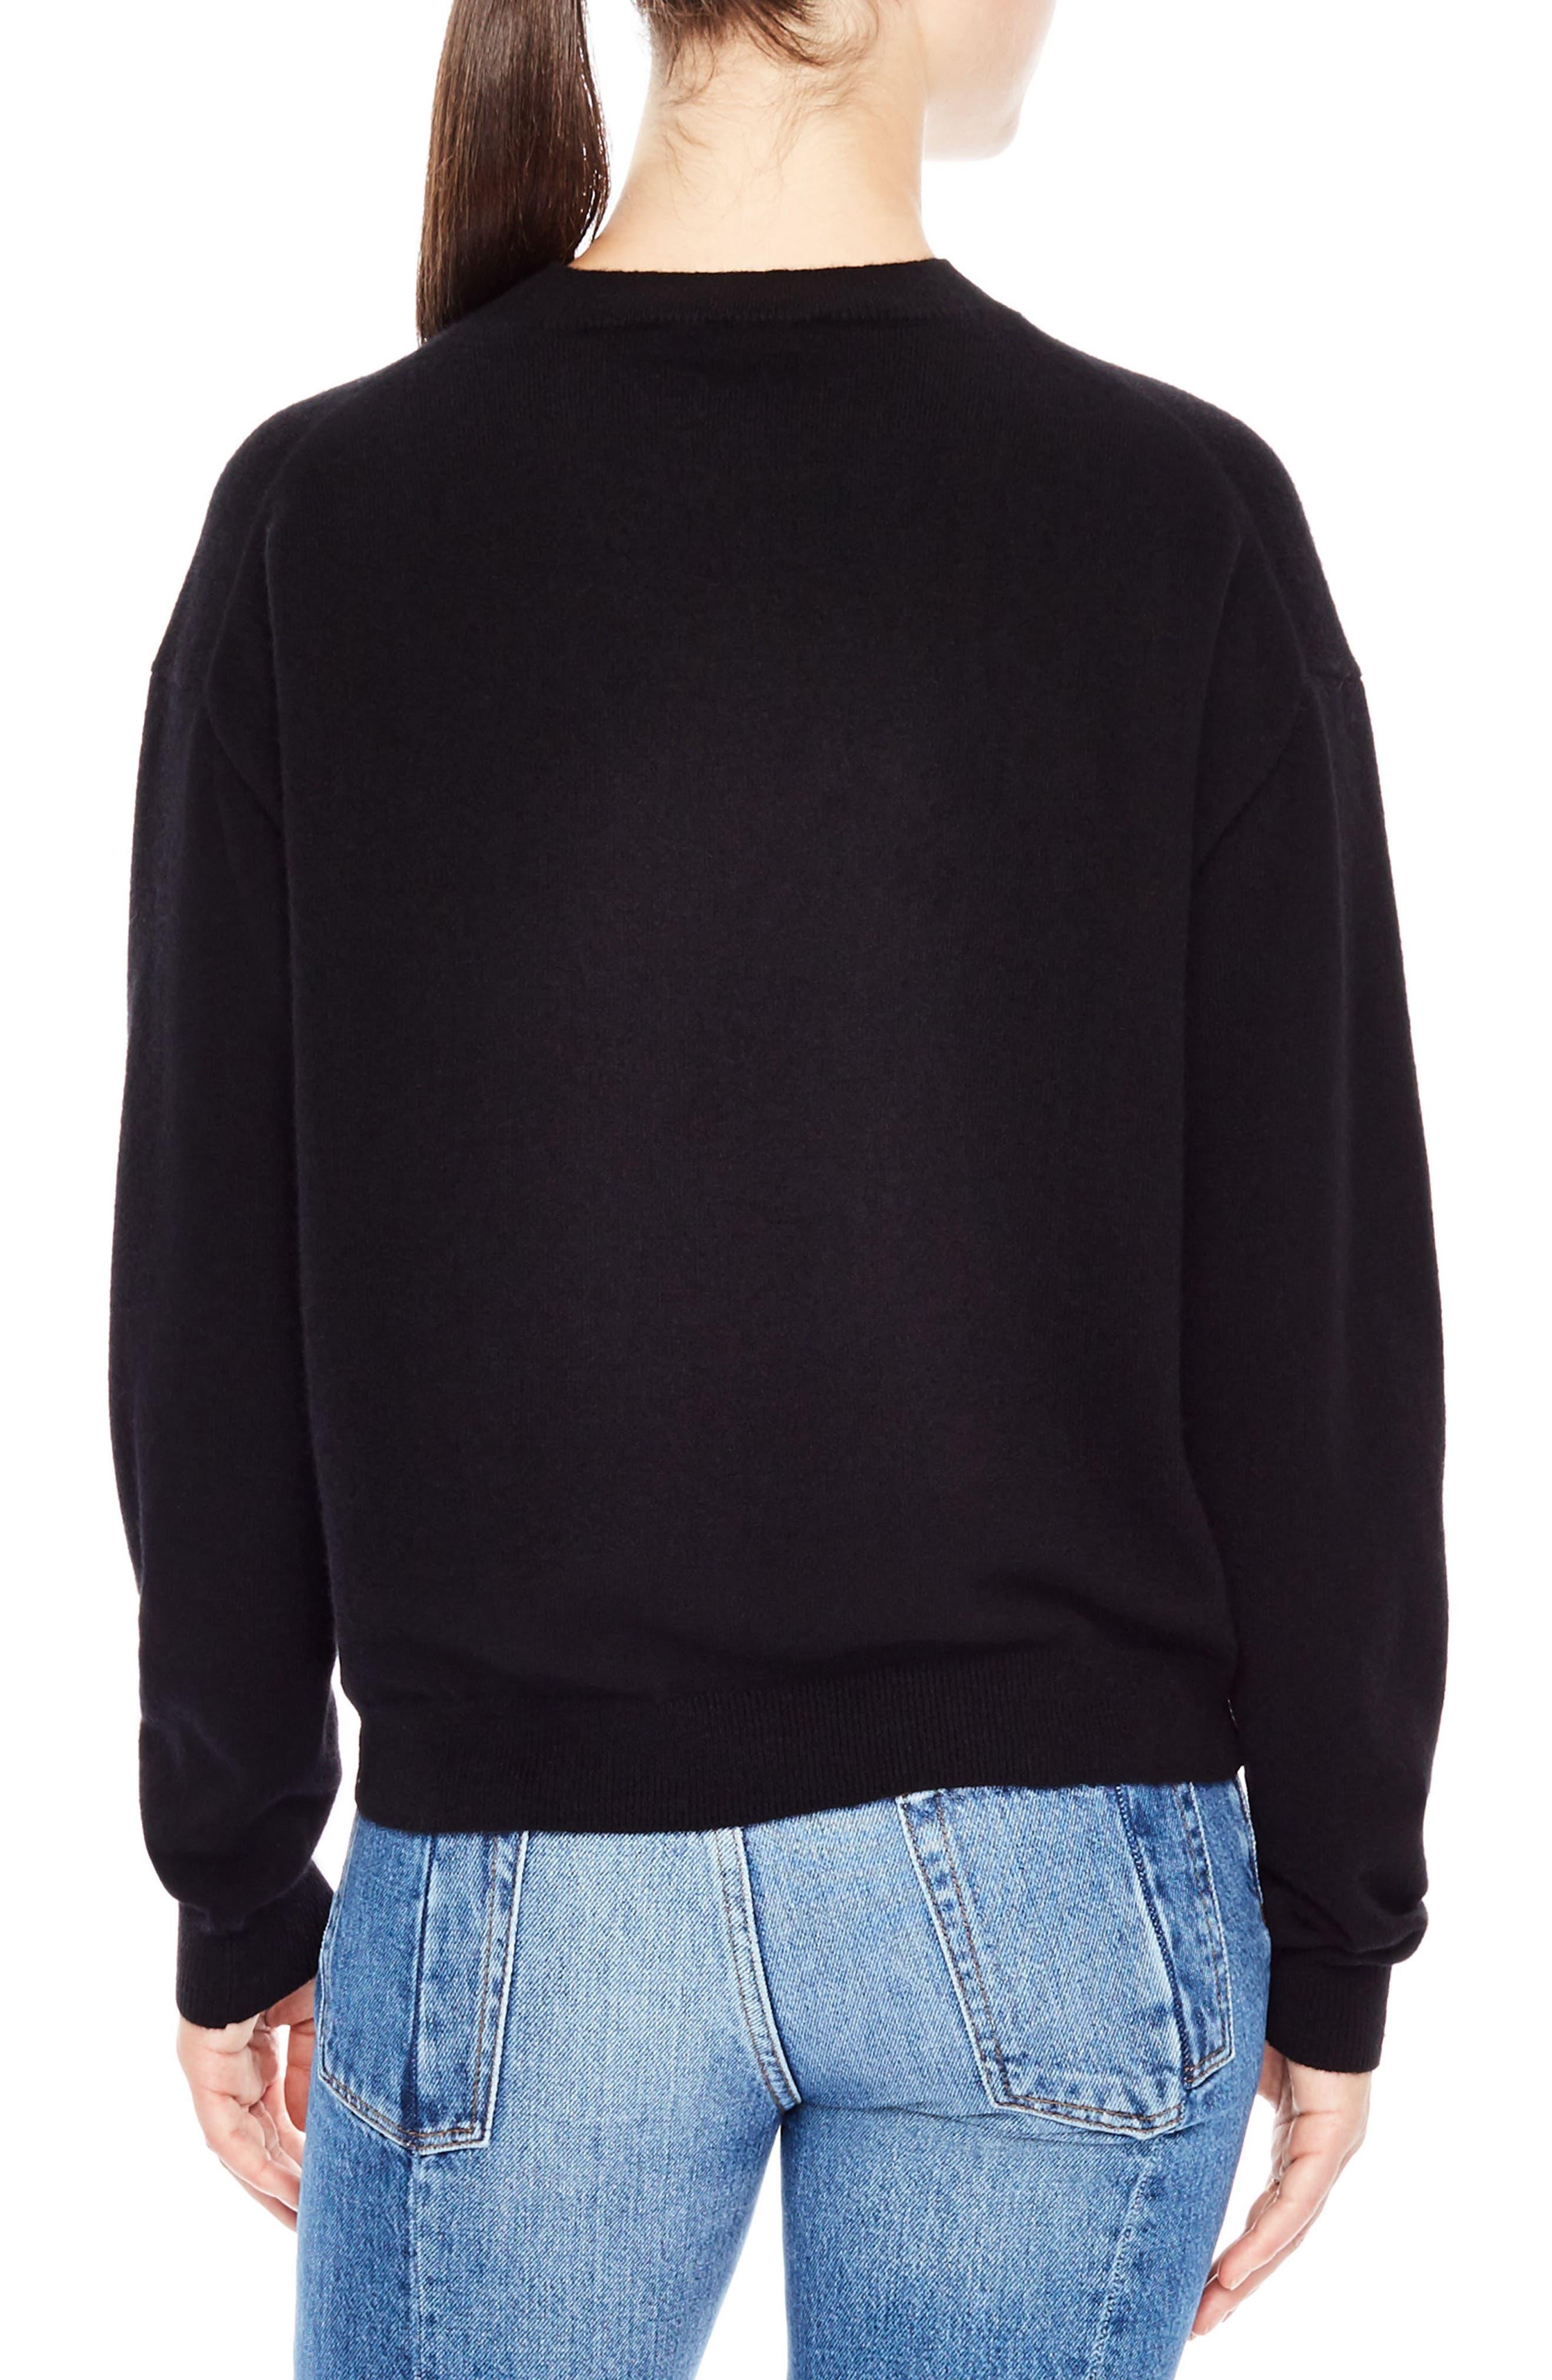 Rupert Just Love U Wool & Cashmere Sweater,                             Alternate thumbnail 2, color,                             001